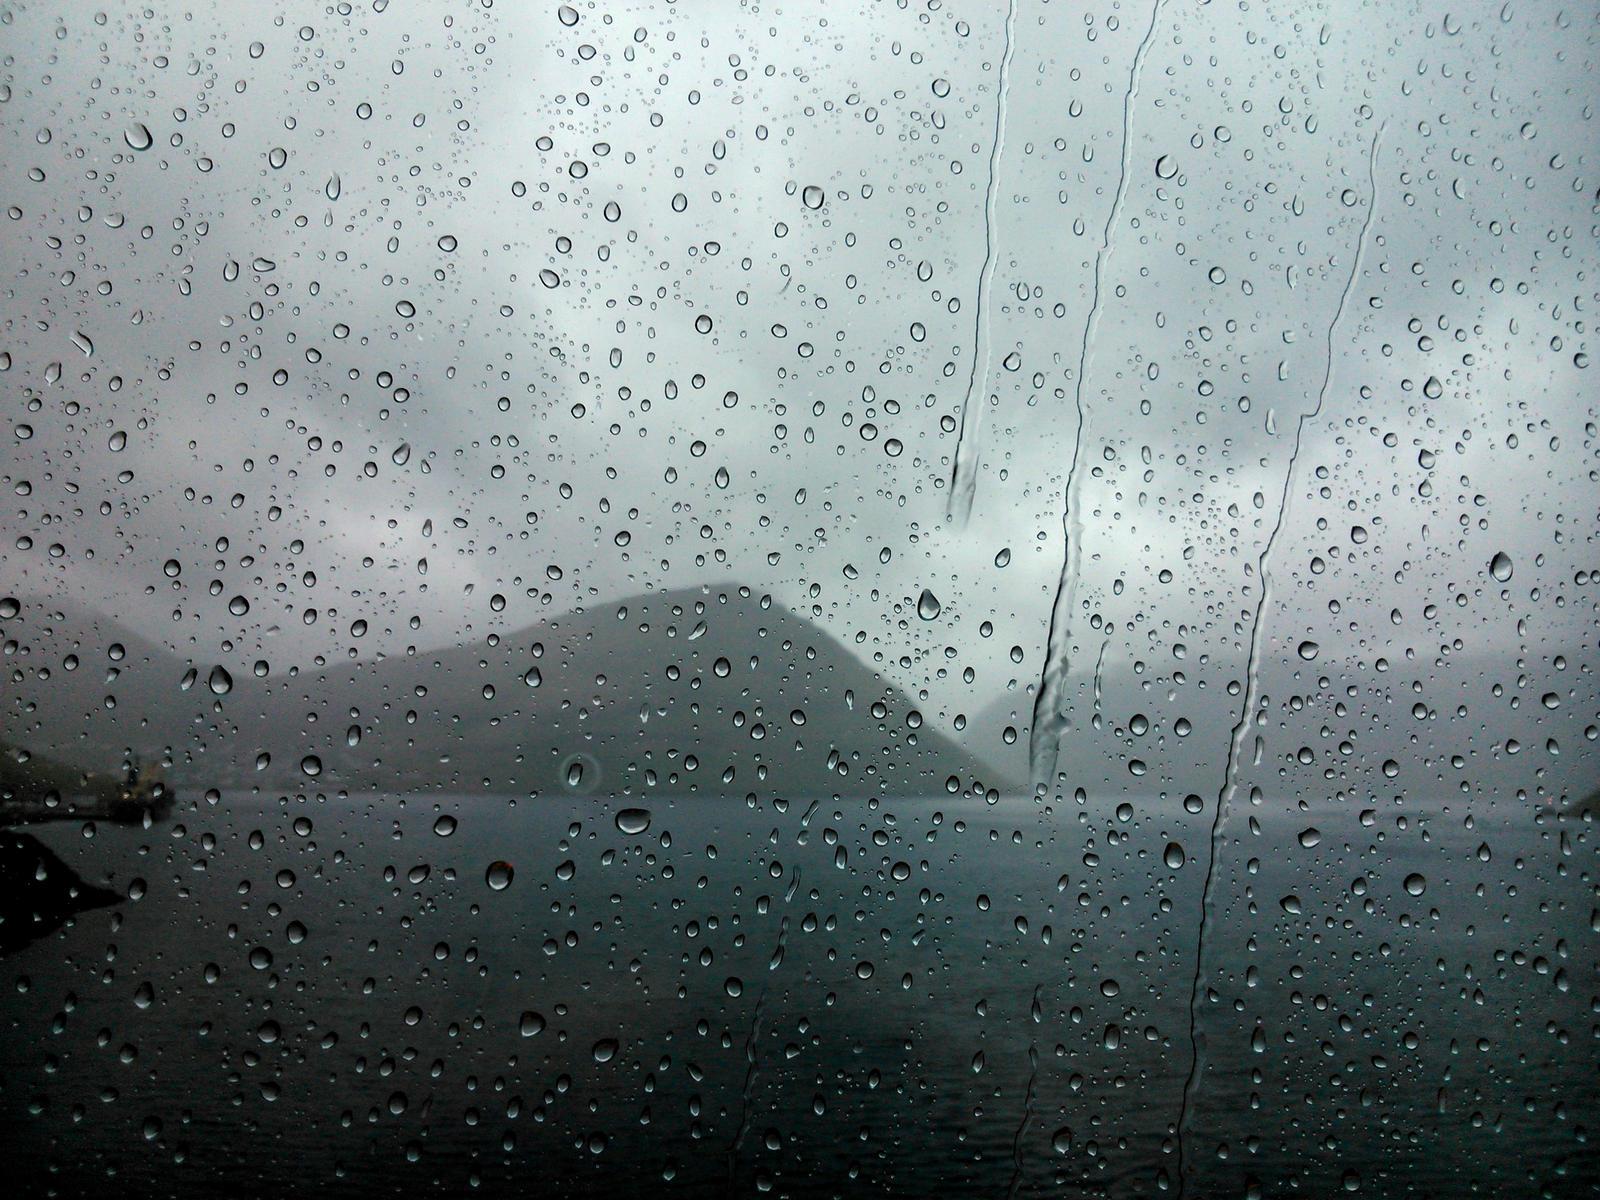 http://img00.deviantart.net/5fb8/i/2014/261/6/1/rain___faroe_islands_by_mittelfranke-d7zmizc.jpg